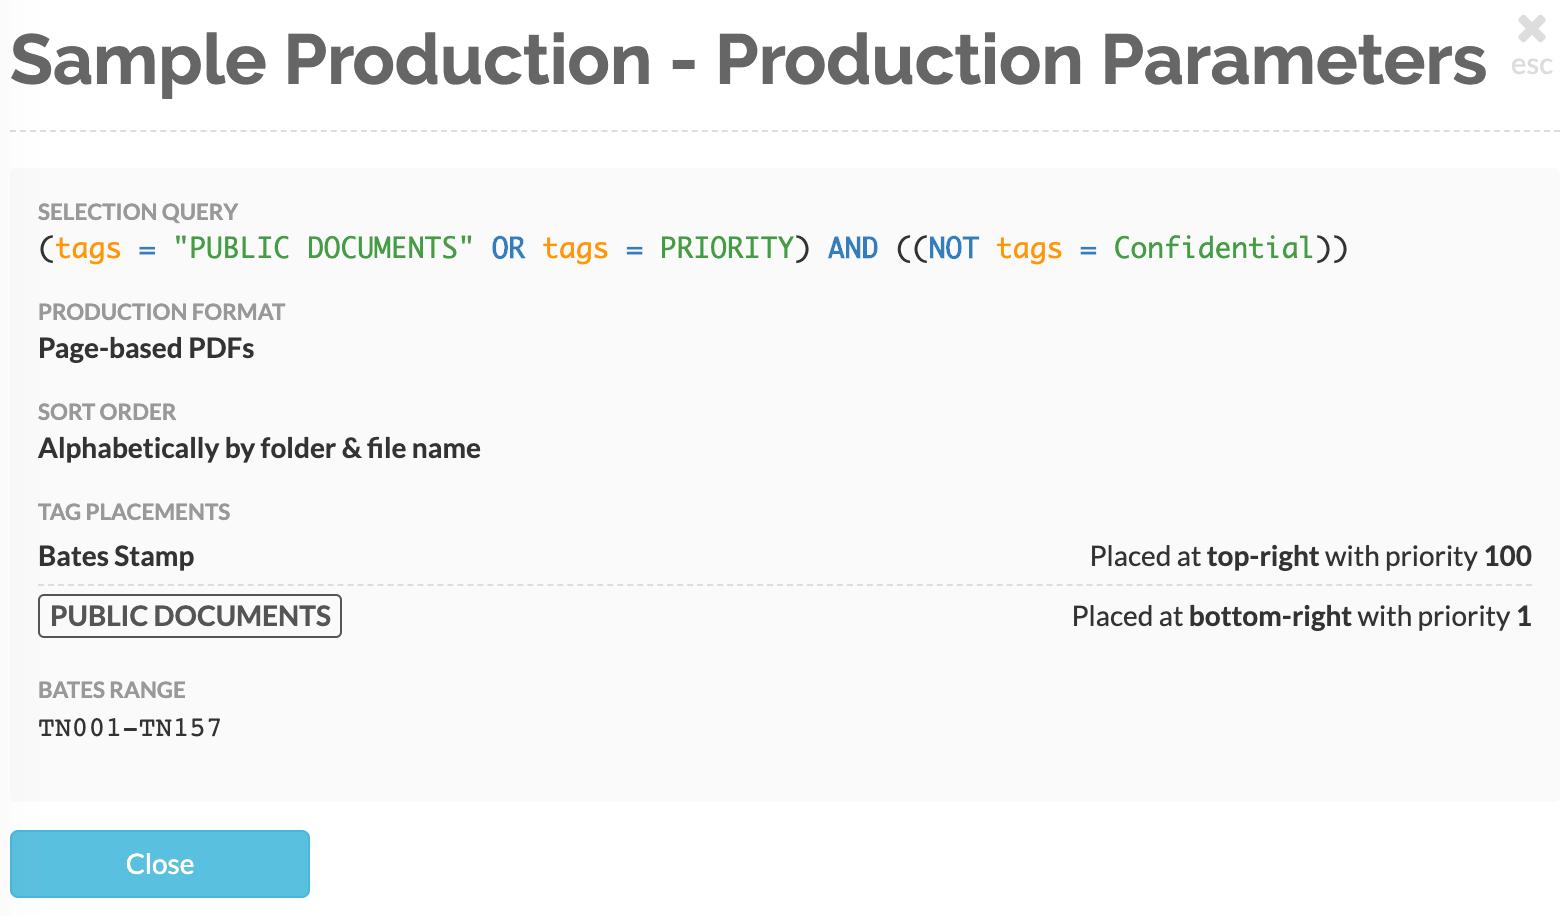 A production summary